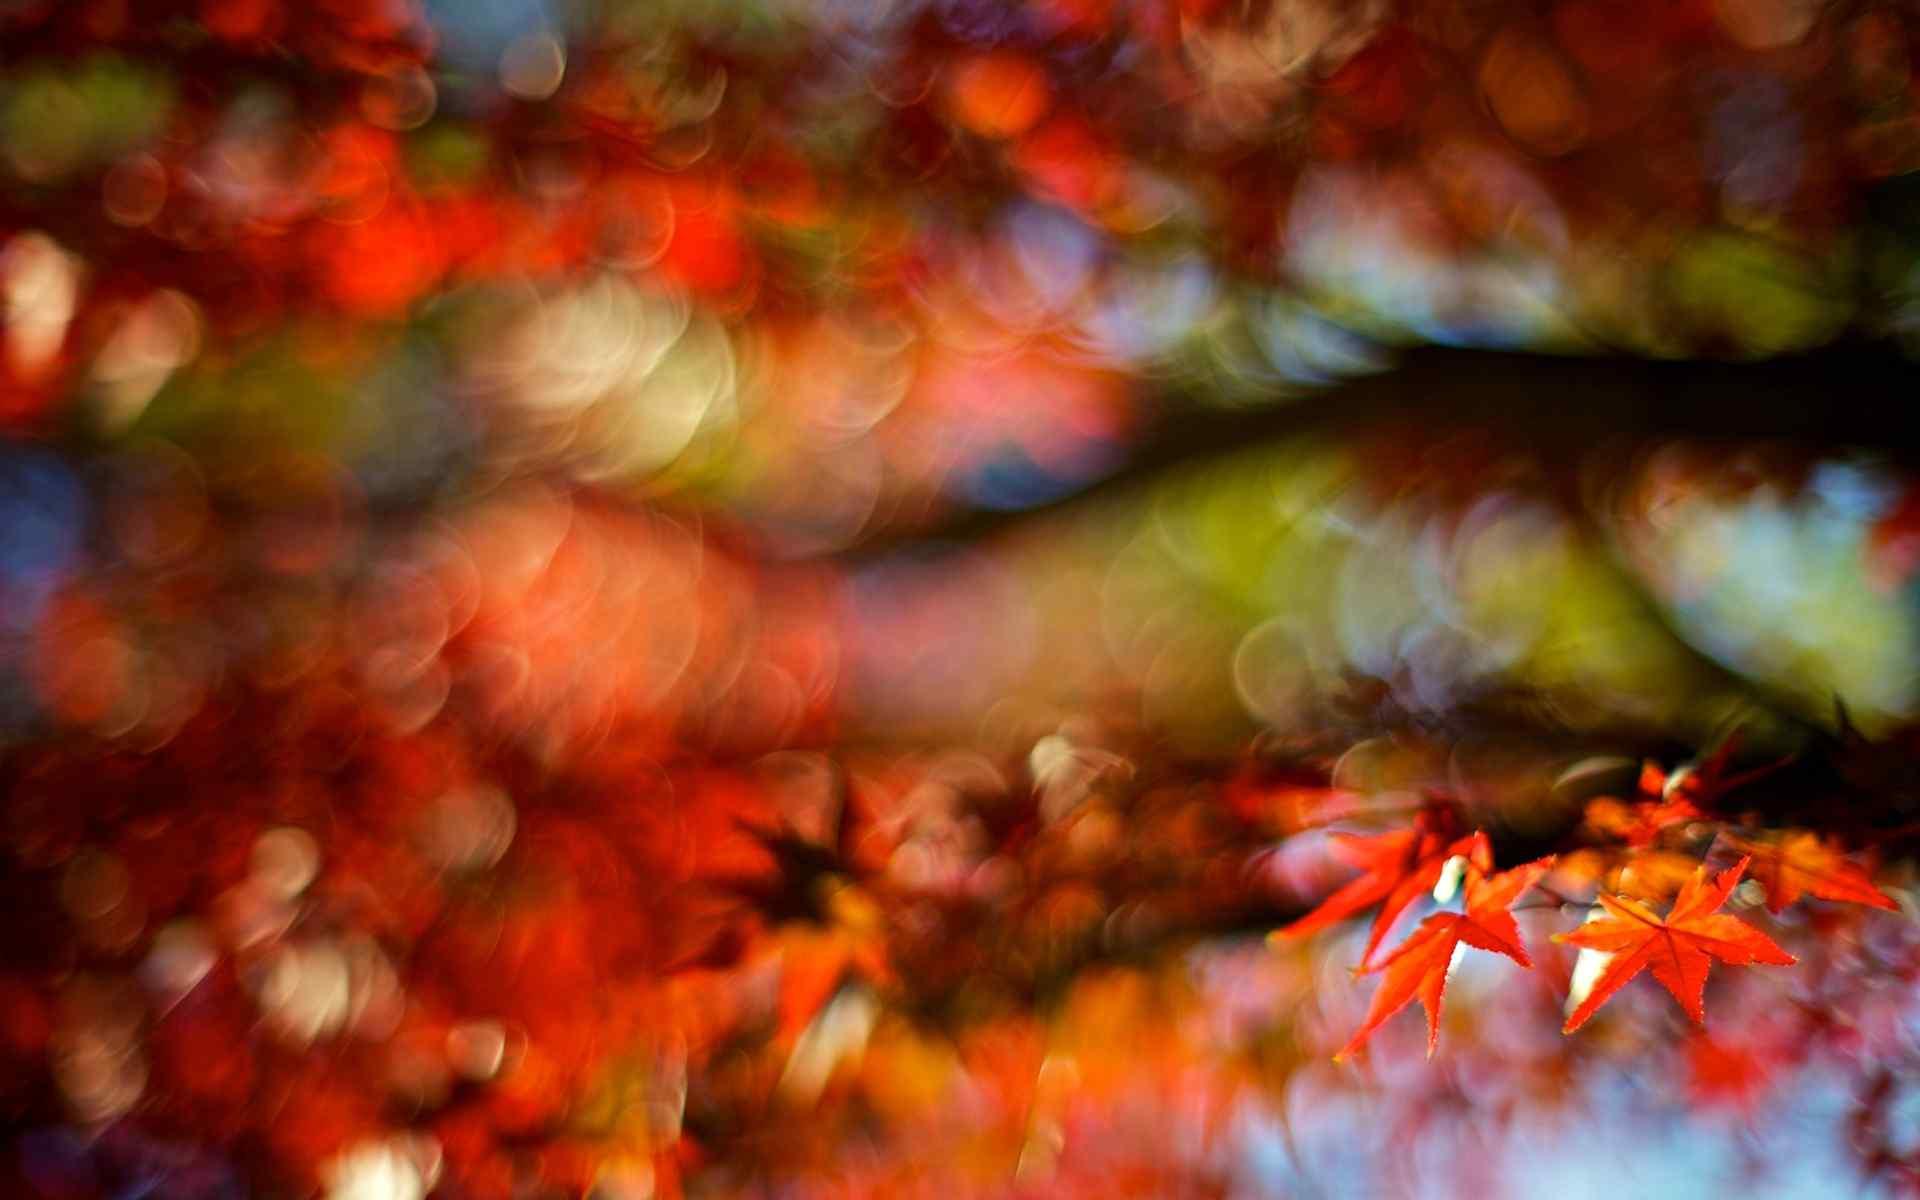 Tree With Leaves Falling Wallpaper 秋天唯美的落叶风景图片高清电脑壁纸 桌面天下(desktx Com)